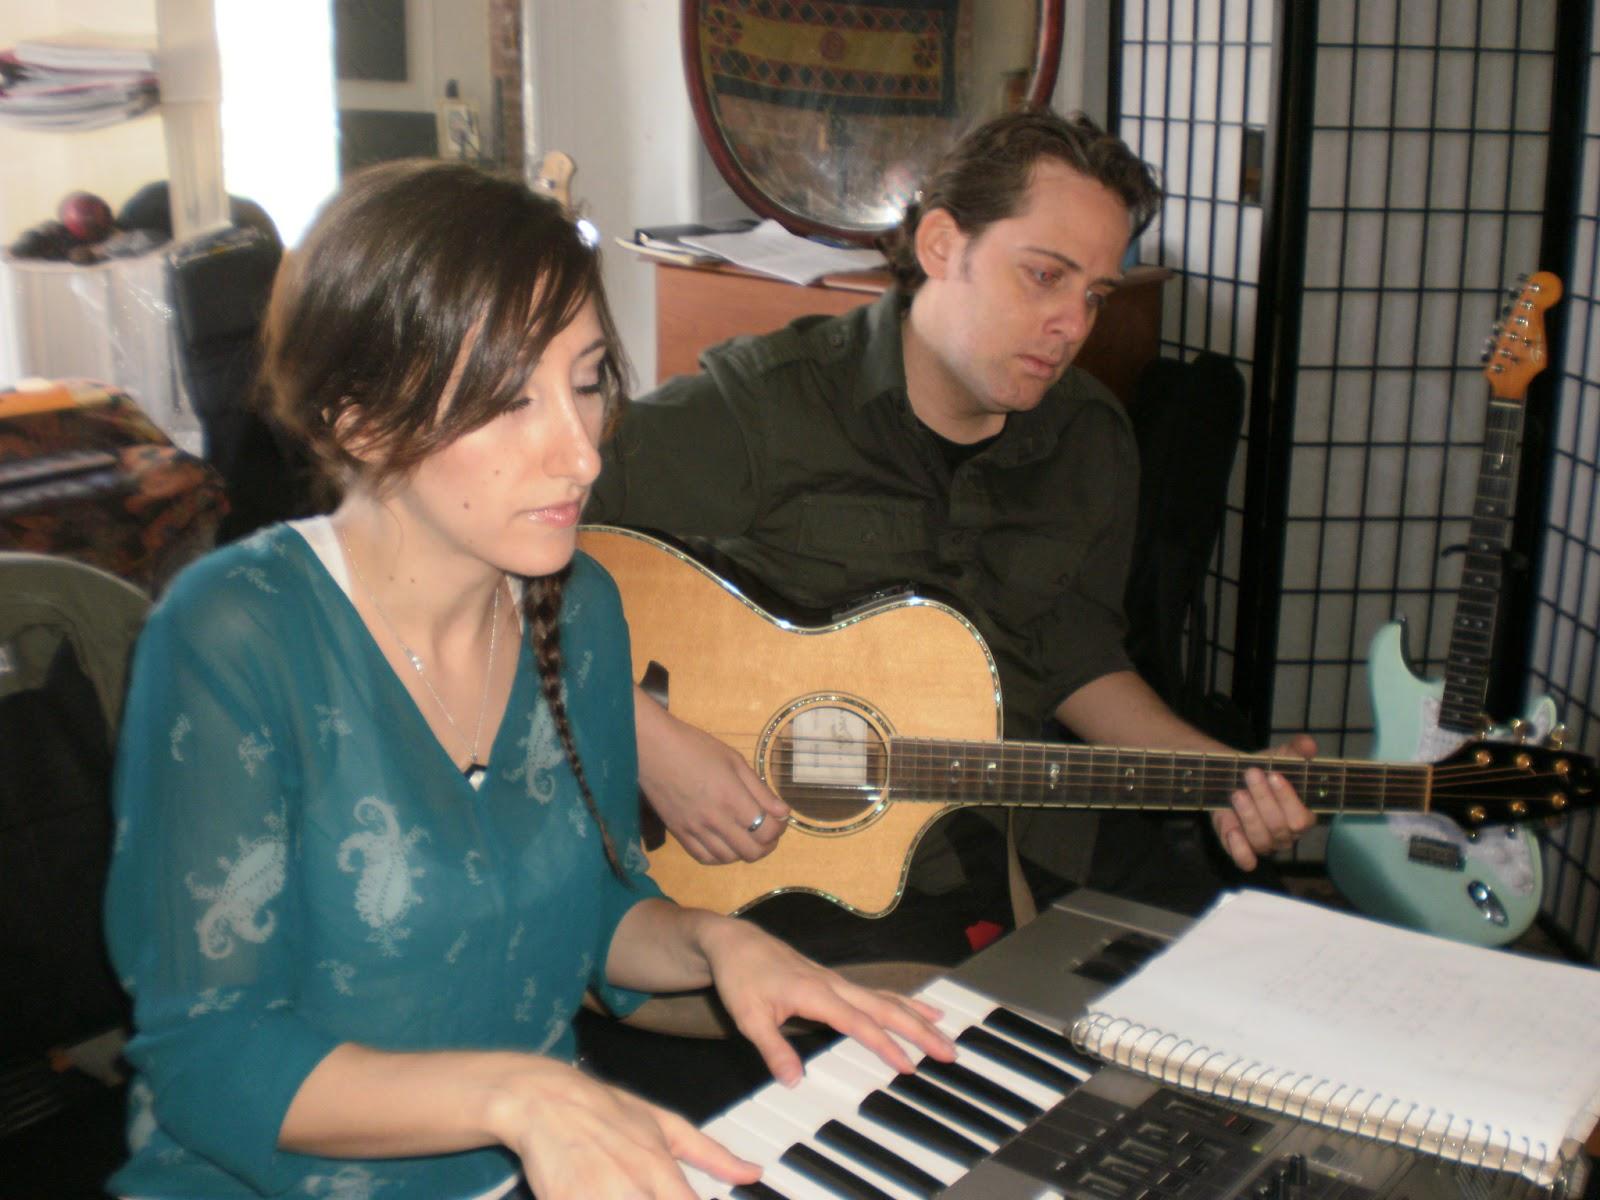 Collaborative Classroom Van Pelt : Streetcredmusic clara lofaro erika van pelt of